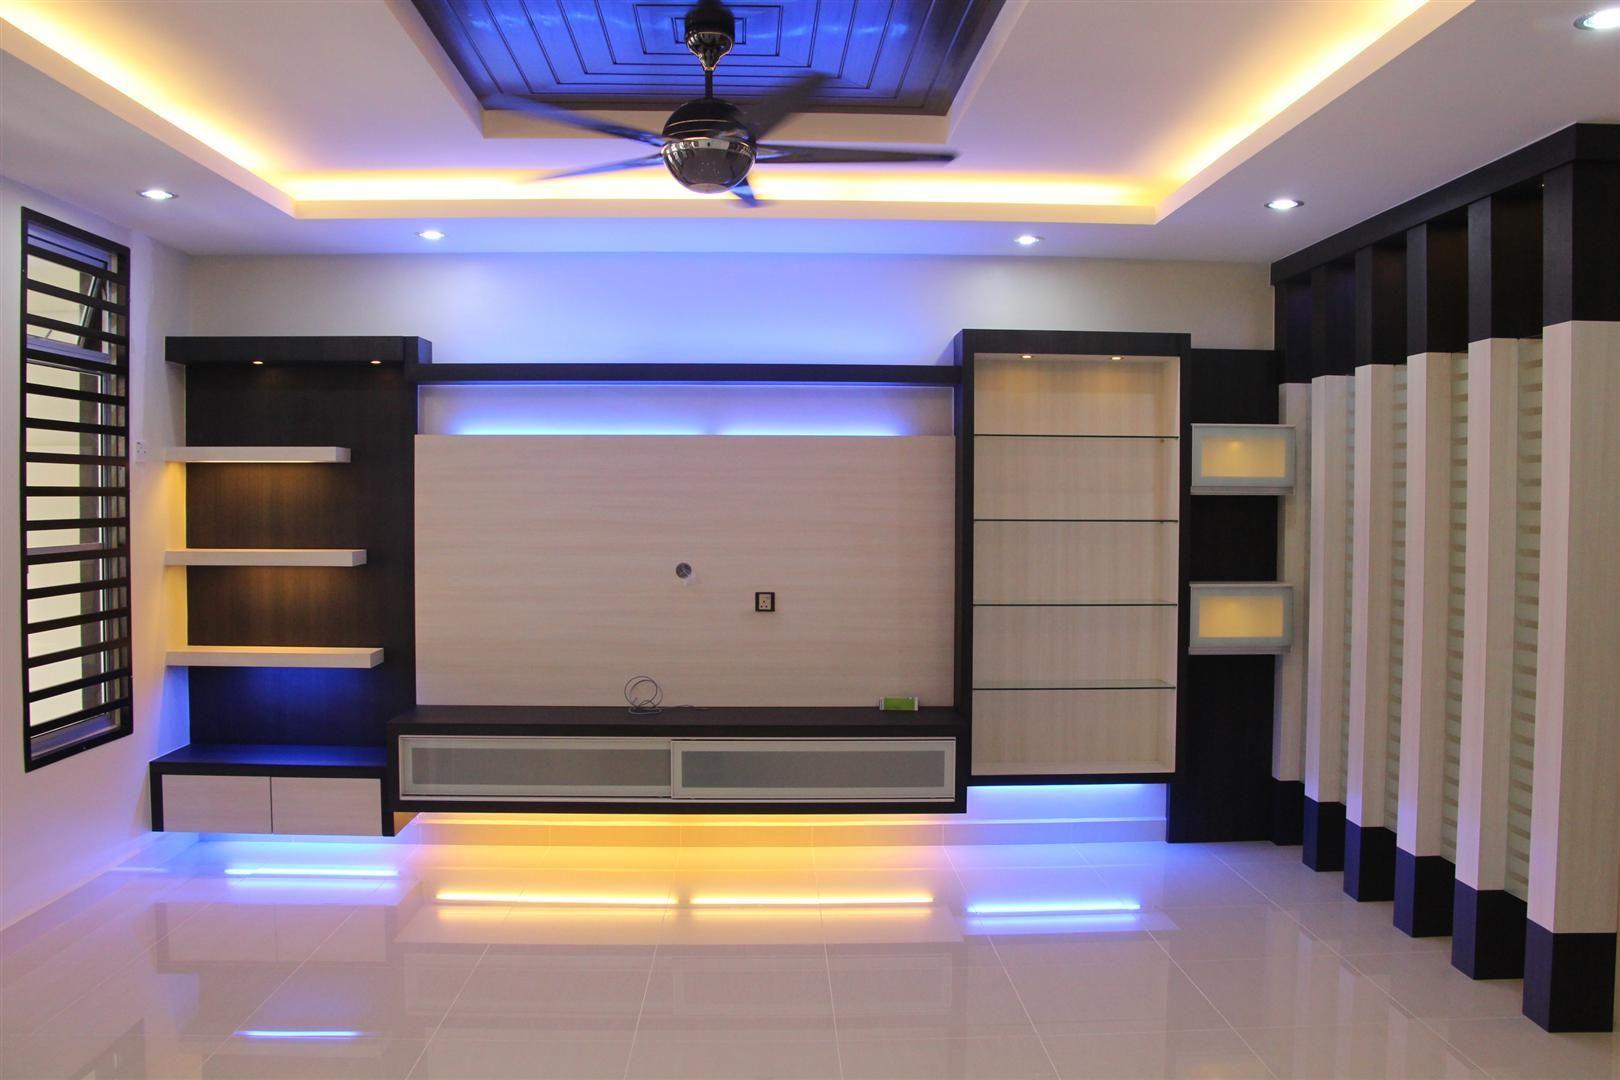 Design Spiegel Hal : Tv hall design all home interior ideas